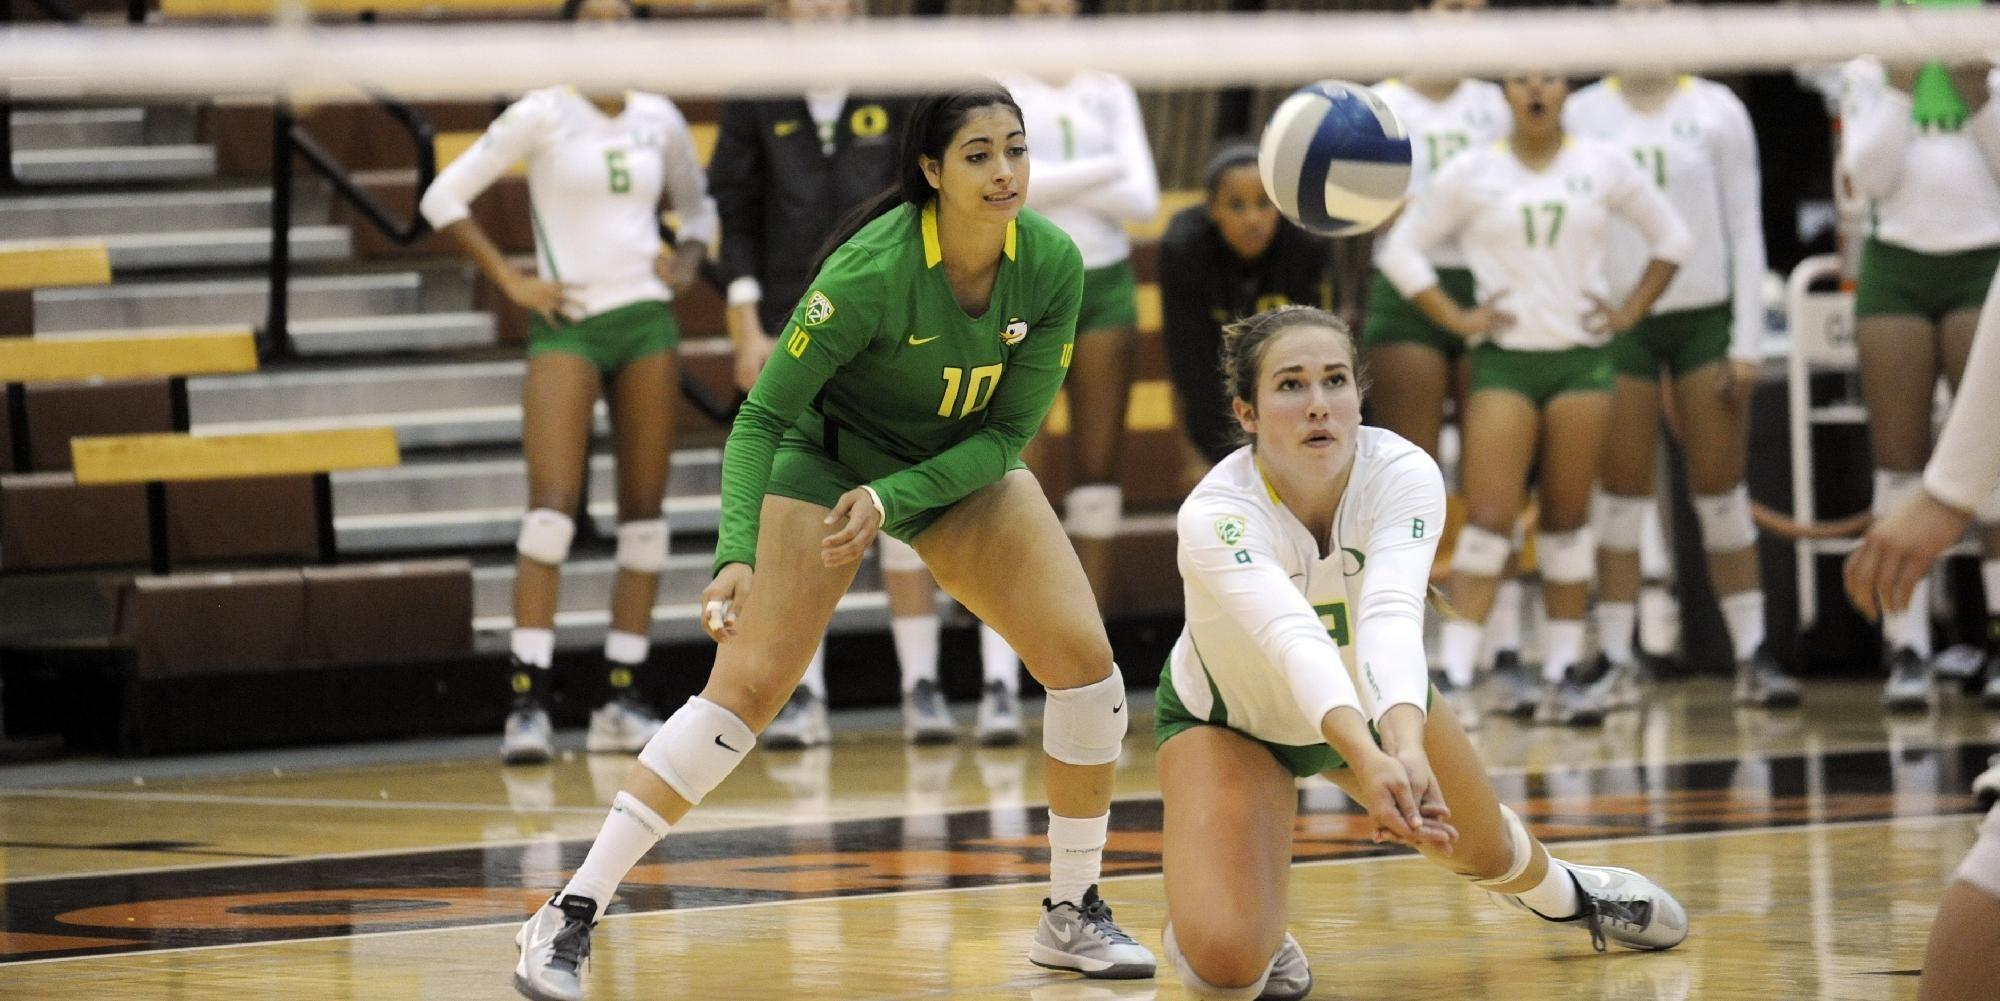 Ducks Drop Five Setter To No 4 Nebraska University Of Oregon Athletics Volleyball News Volleyball Team University Of Oregon